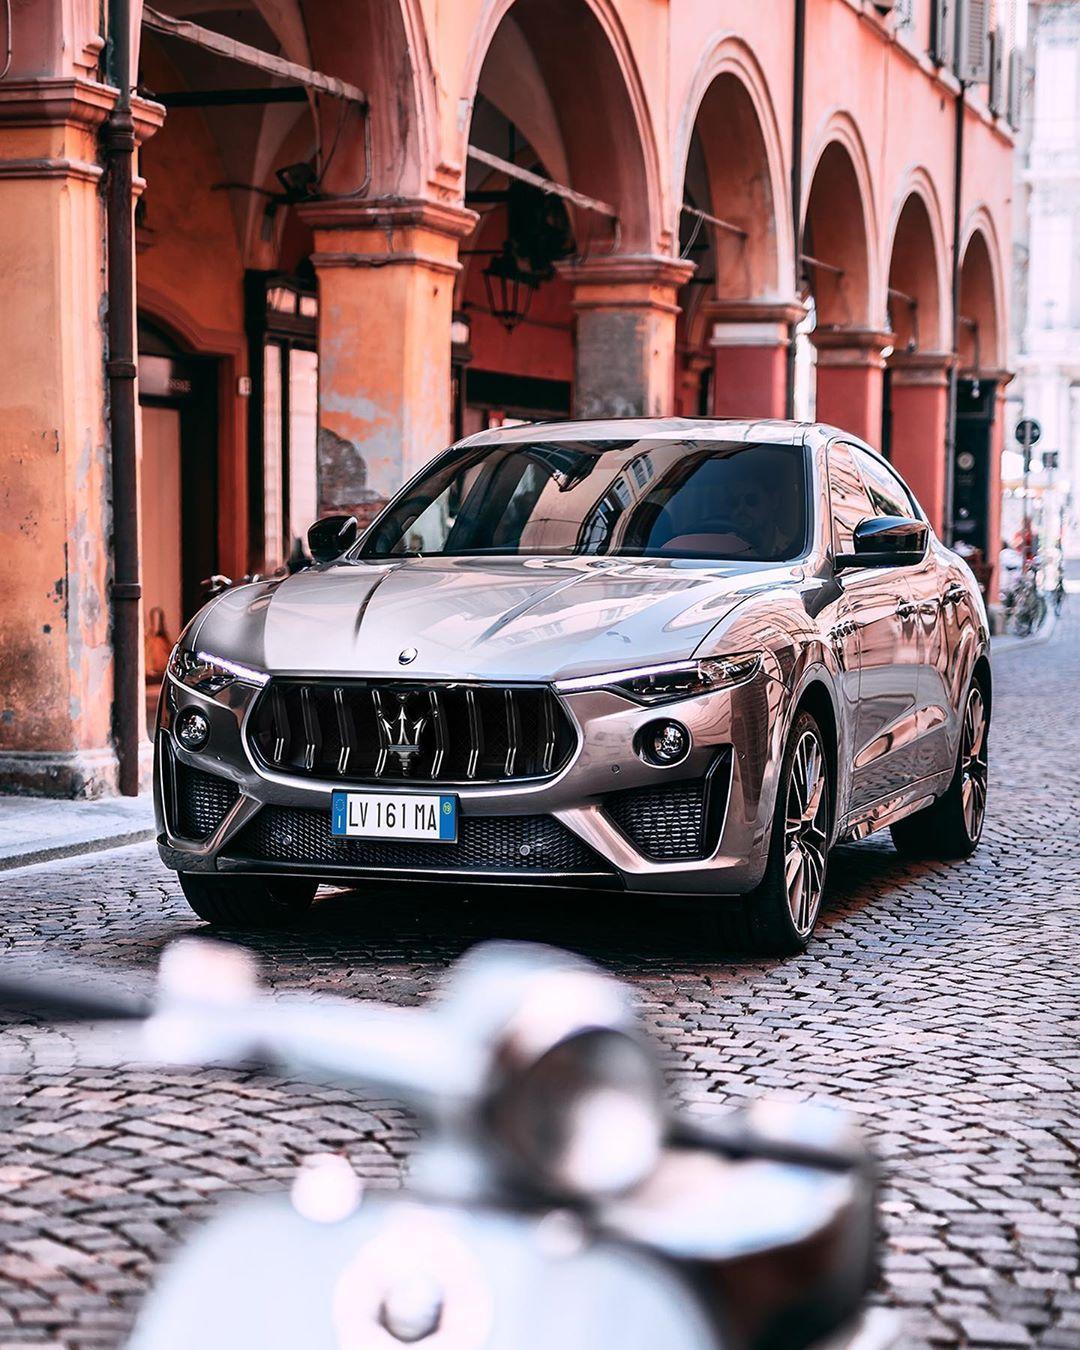 "Maserati on Instagram: ""Capturing the Italian atmosphere in one frame.  #MaseratiLevanteTrofeo #Maserati"""